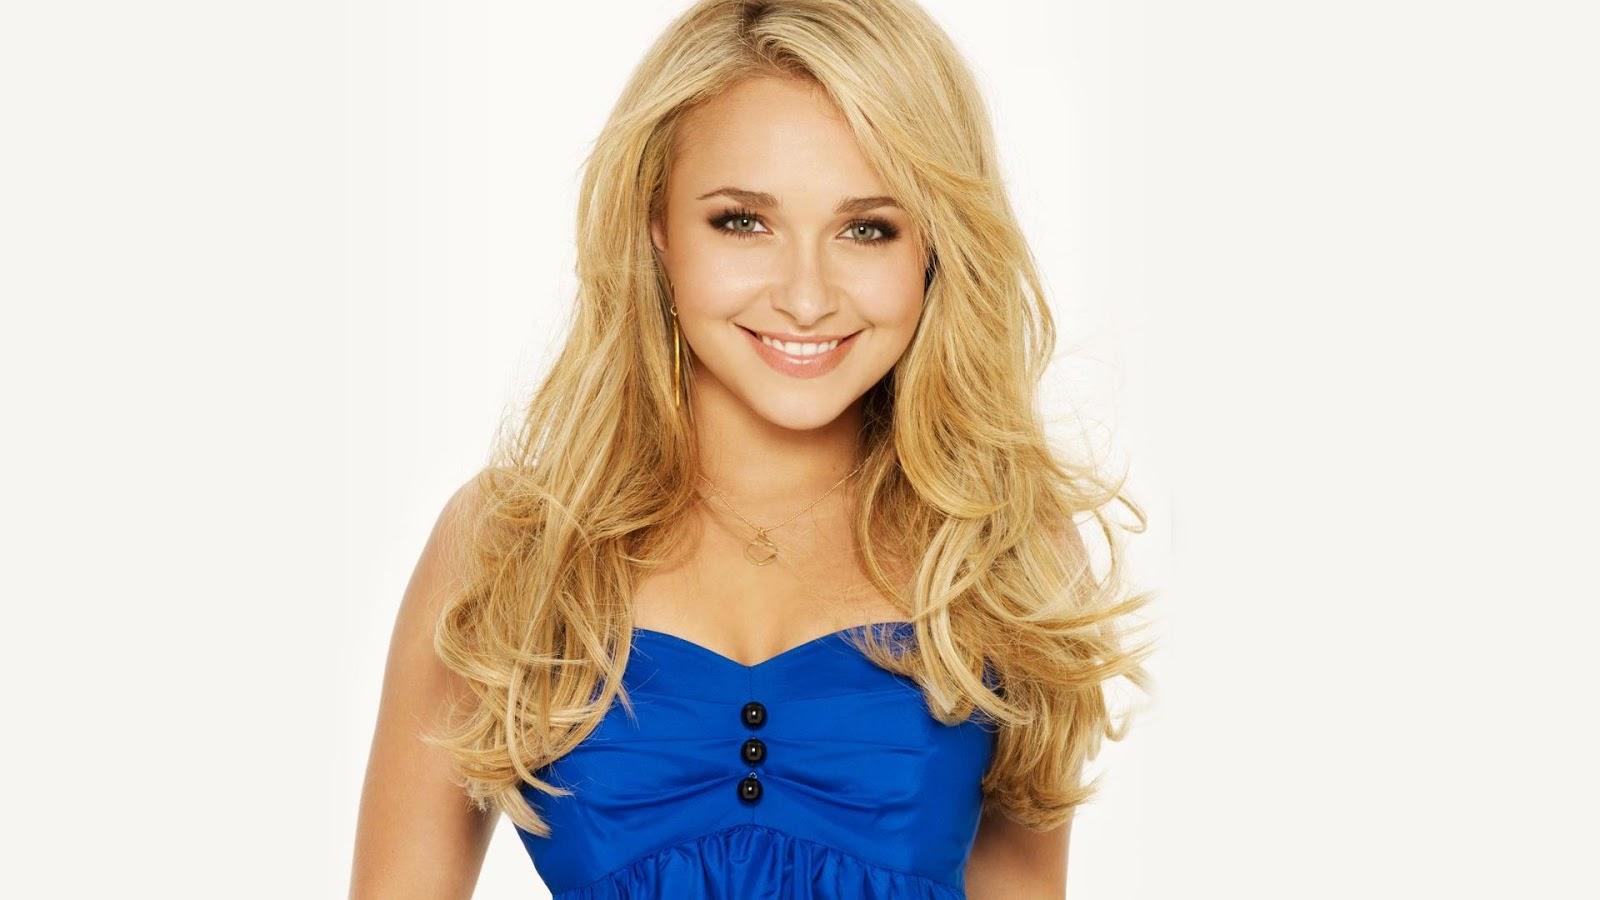 http://4.bp.blogspot.com/-8X5uvSE-eEA/USdtTVml9YI/AAAAAAAAFOM/ohS3rCI2pos/s1600/actress-Hayden-Panettiere-smiles-blue--1080x1920.jpg